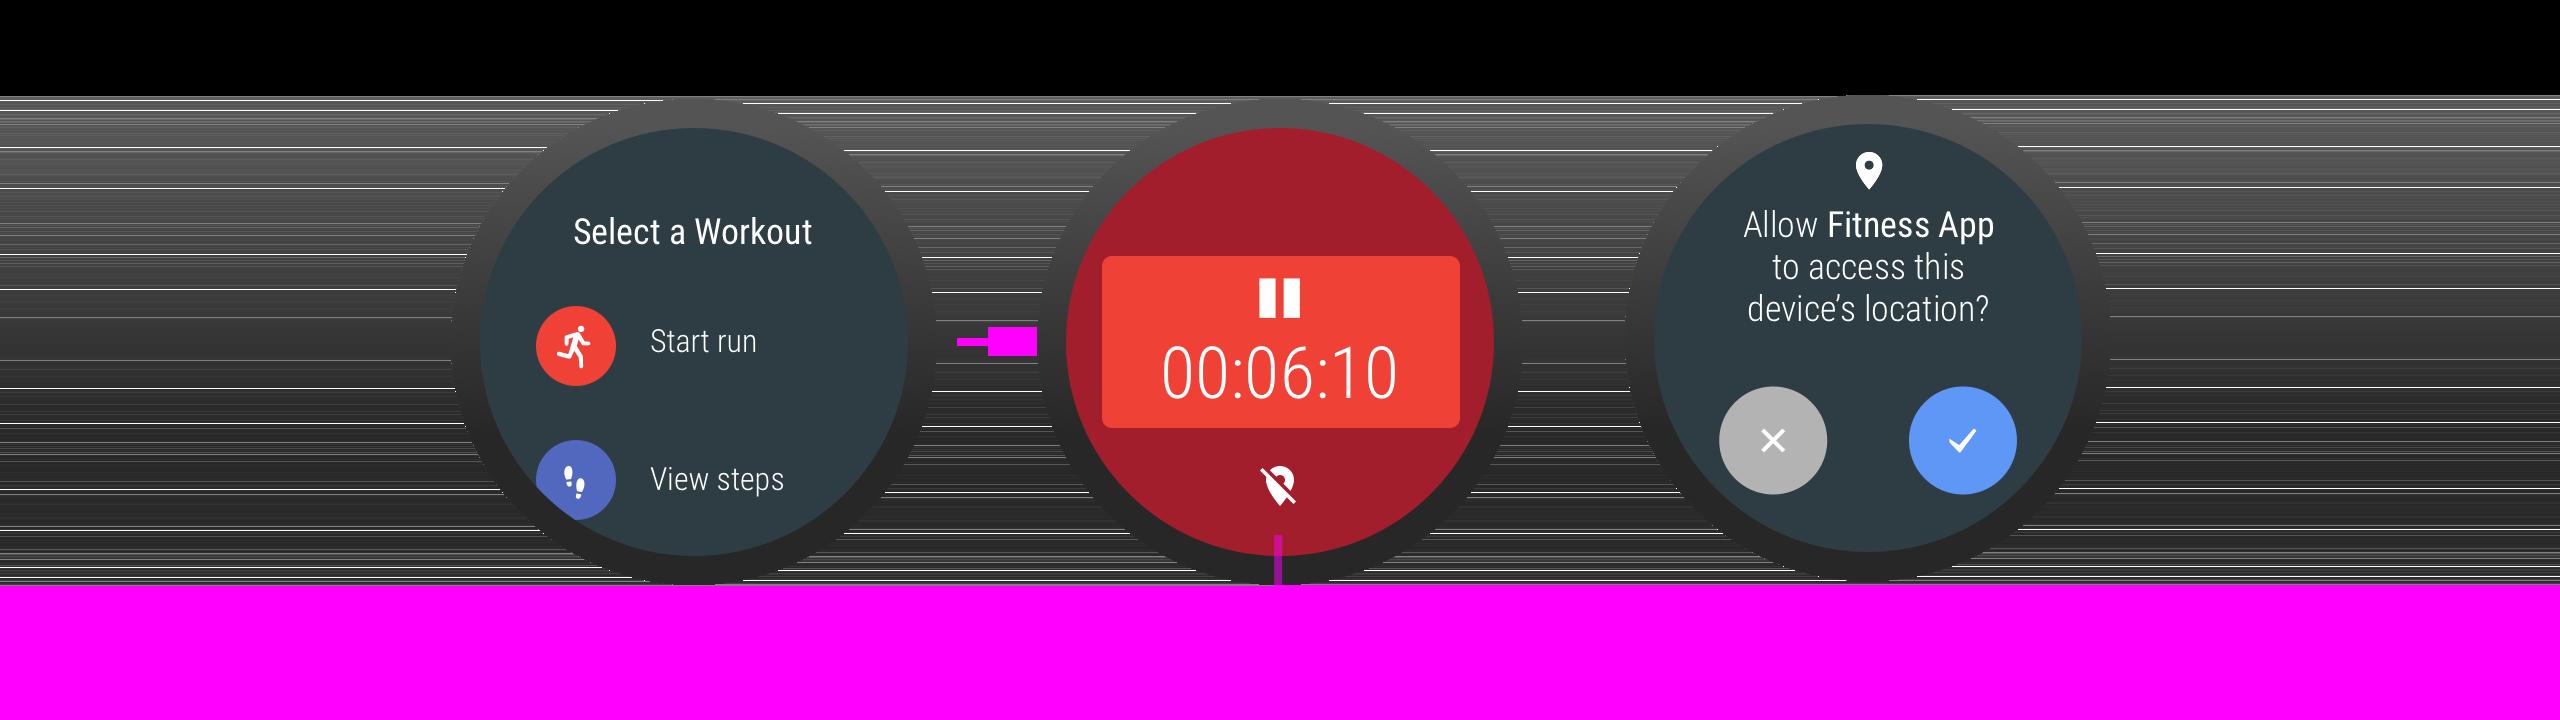 Ketika kebutuhan izin muncul, aplikasi menjelaskan mengapa izin diperlukan.